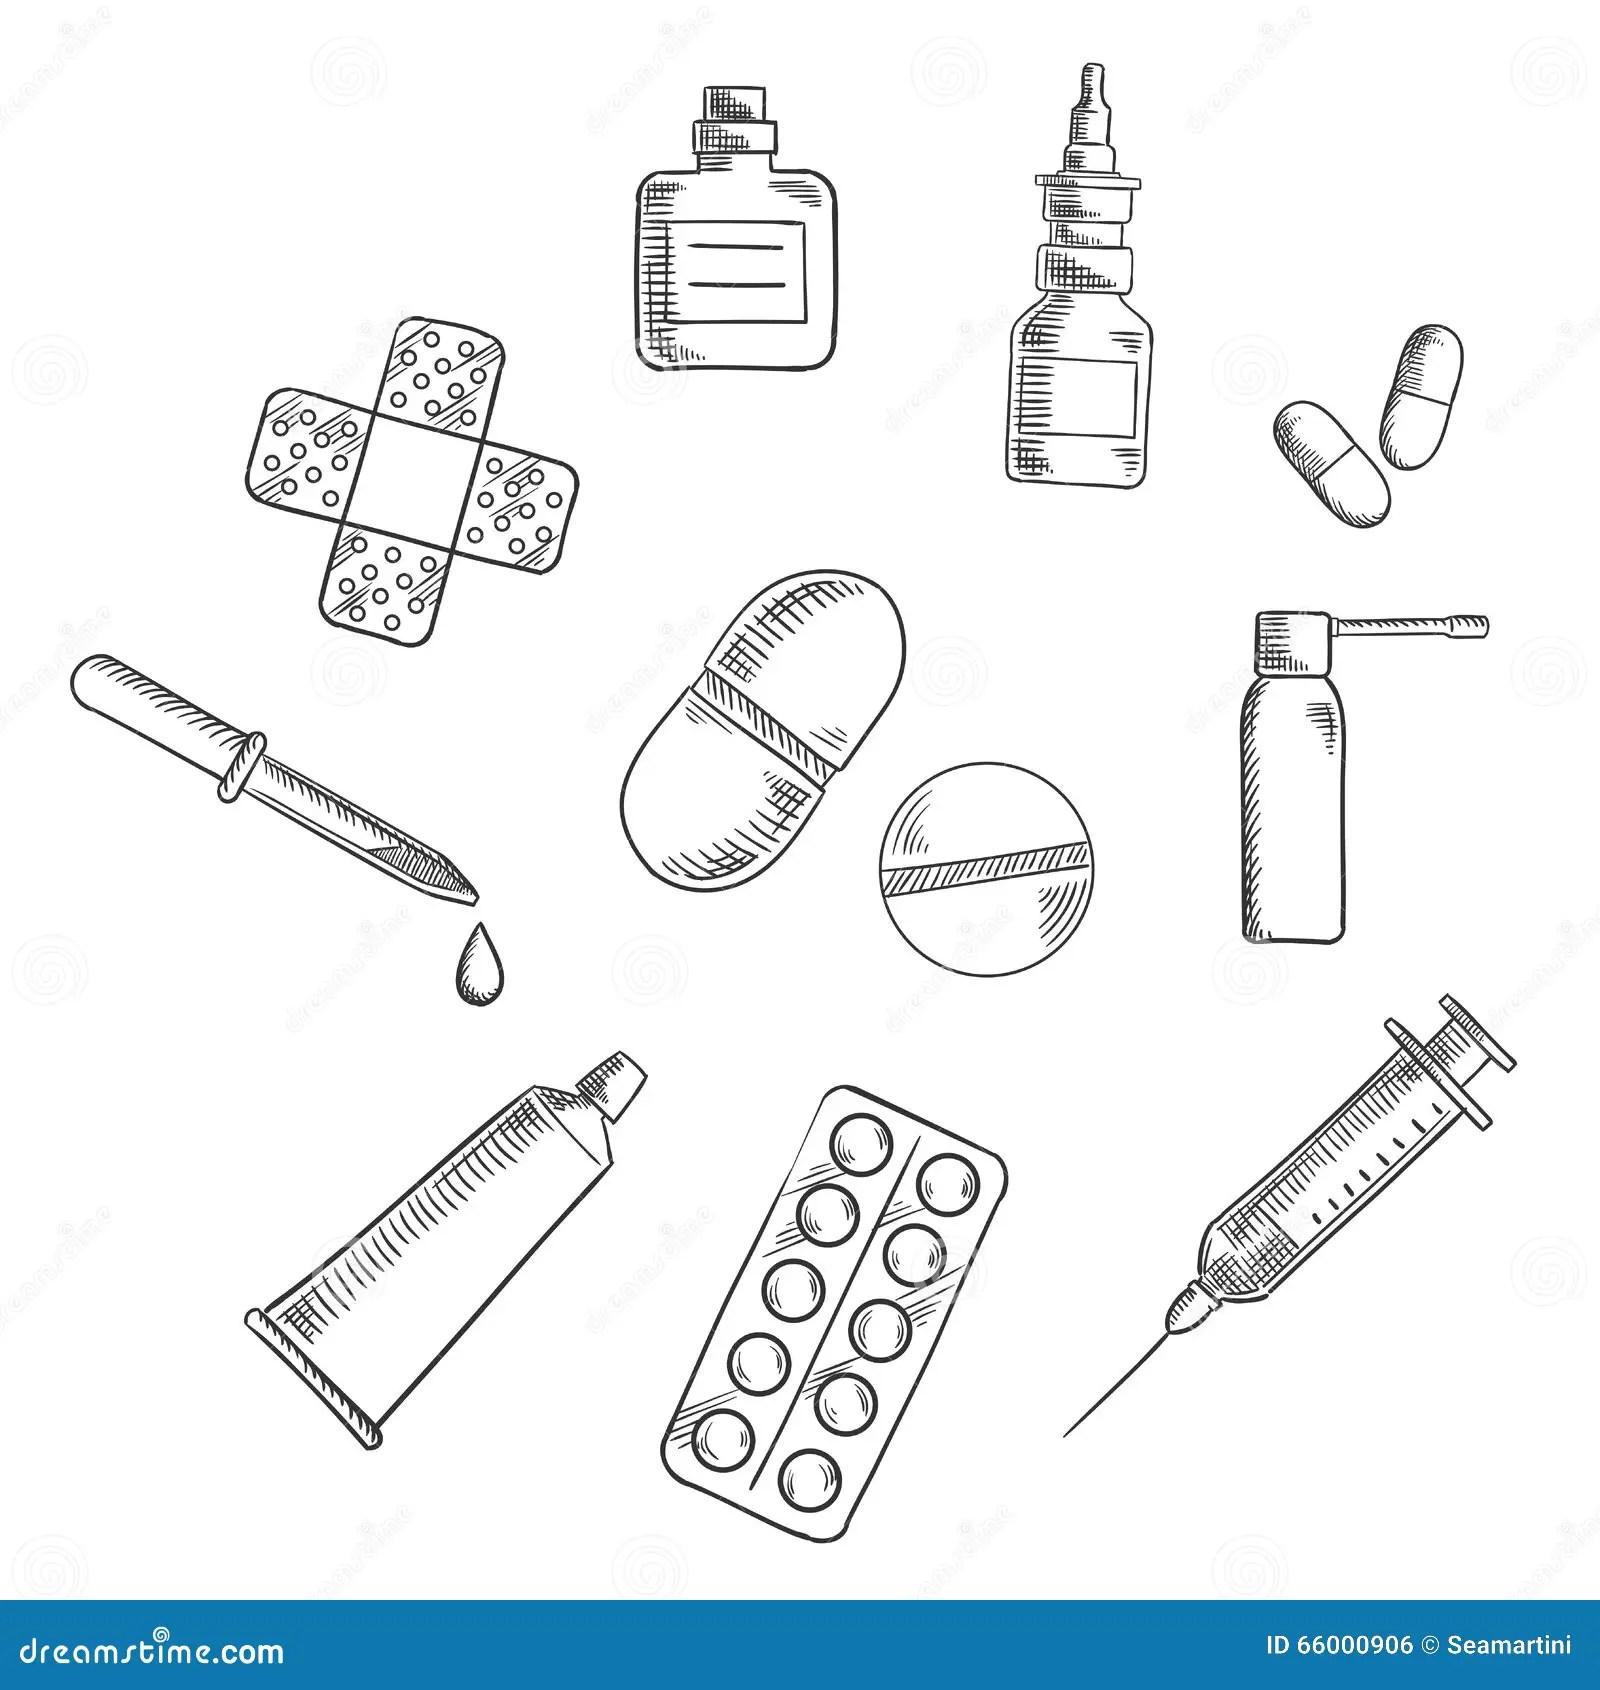 Pillen Drogen Und Medizinische Ikonenskizzen Vektor